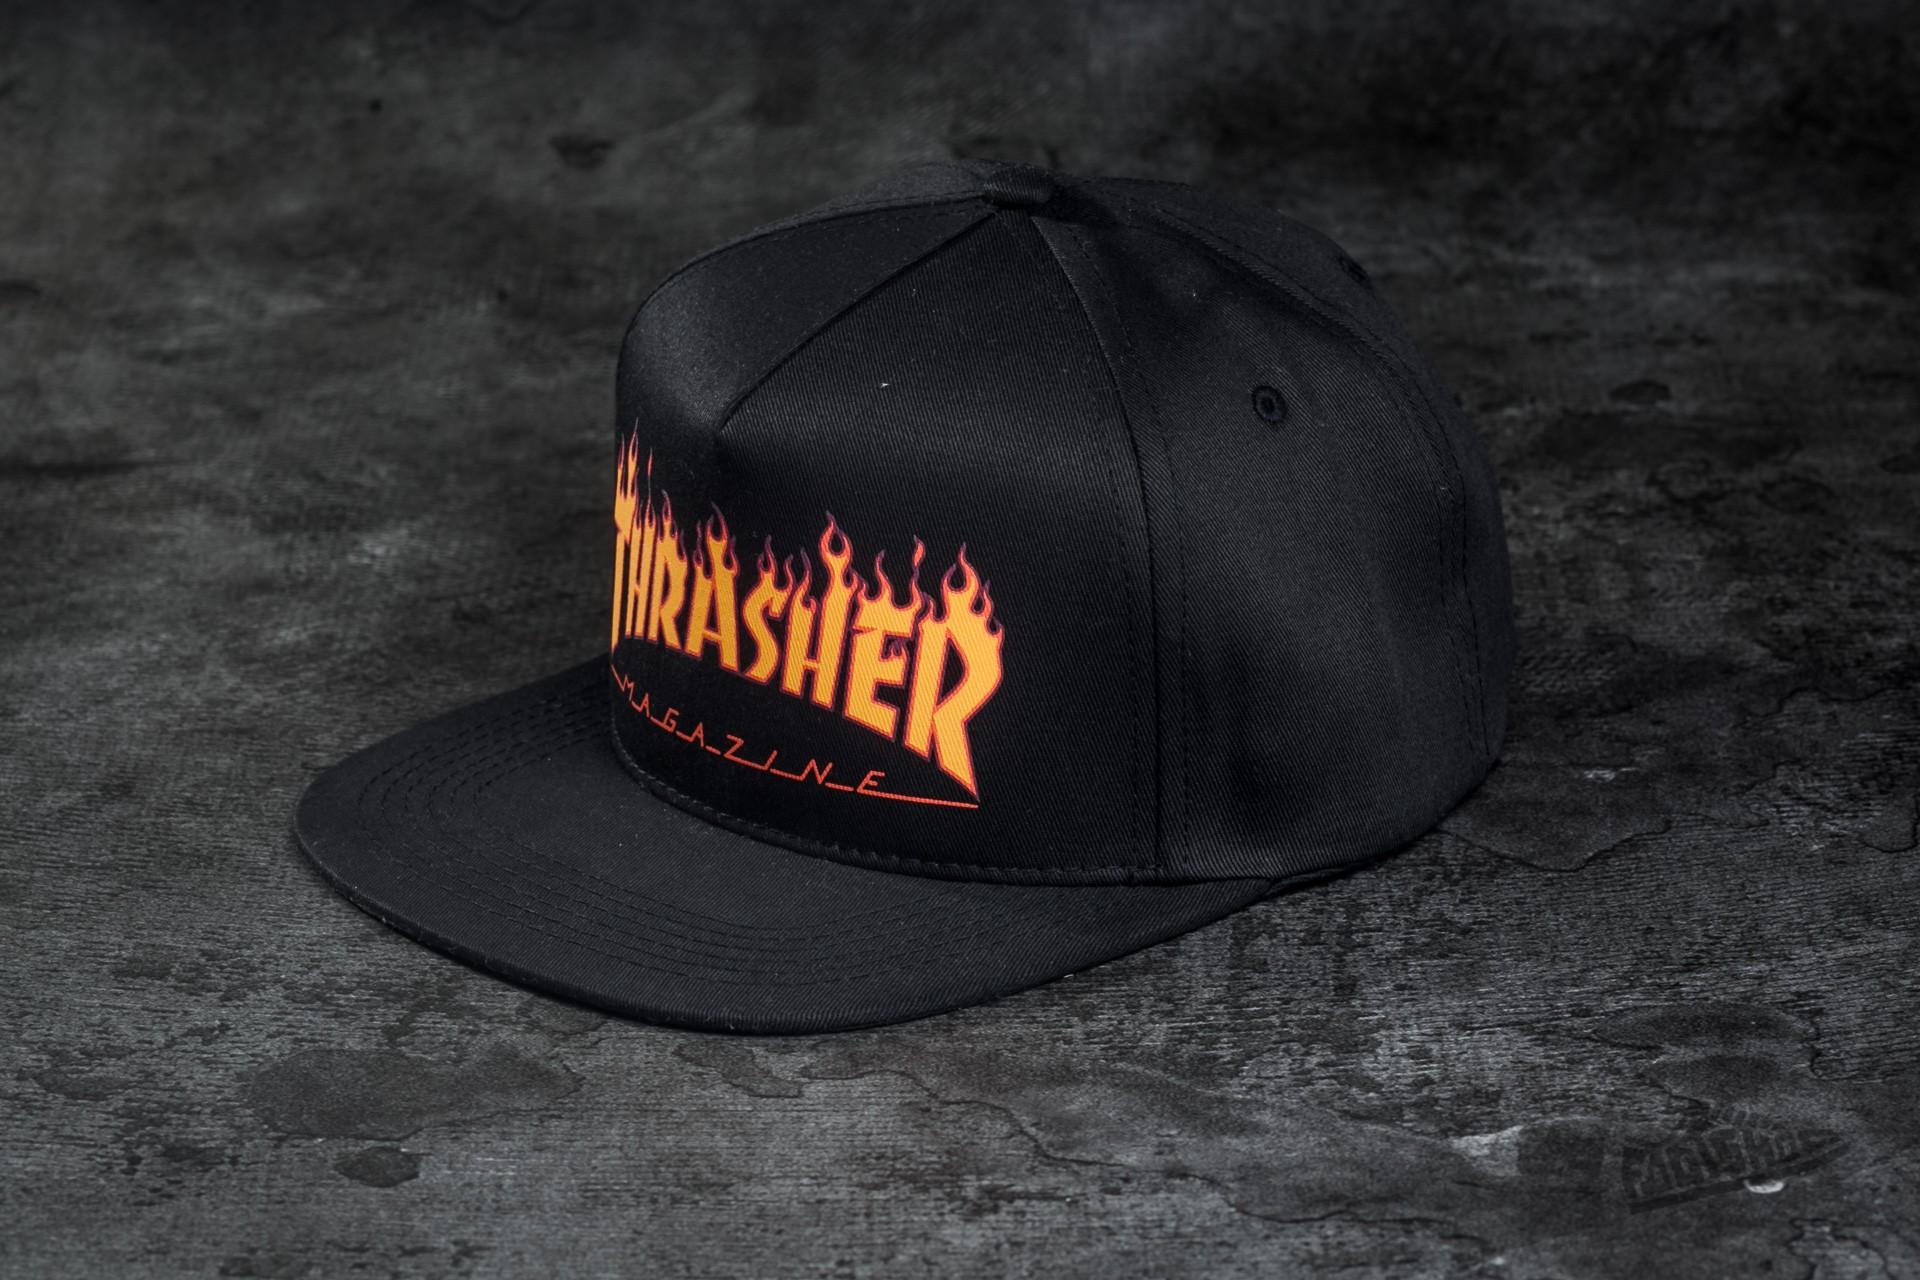 5ac487ceb07 Thrasher Flame Logo Structured Snapback Black